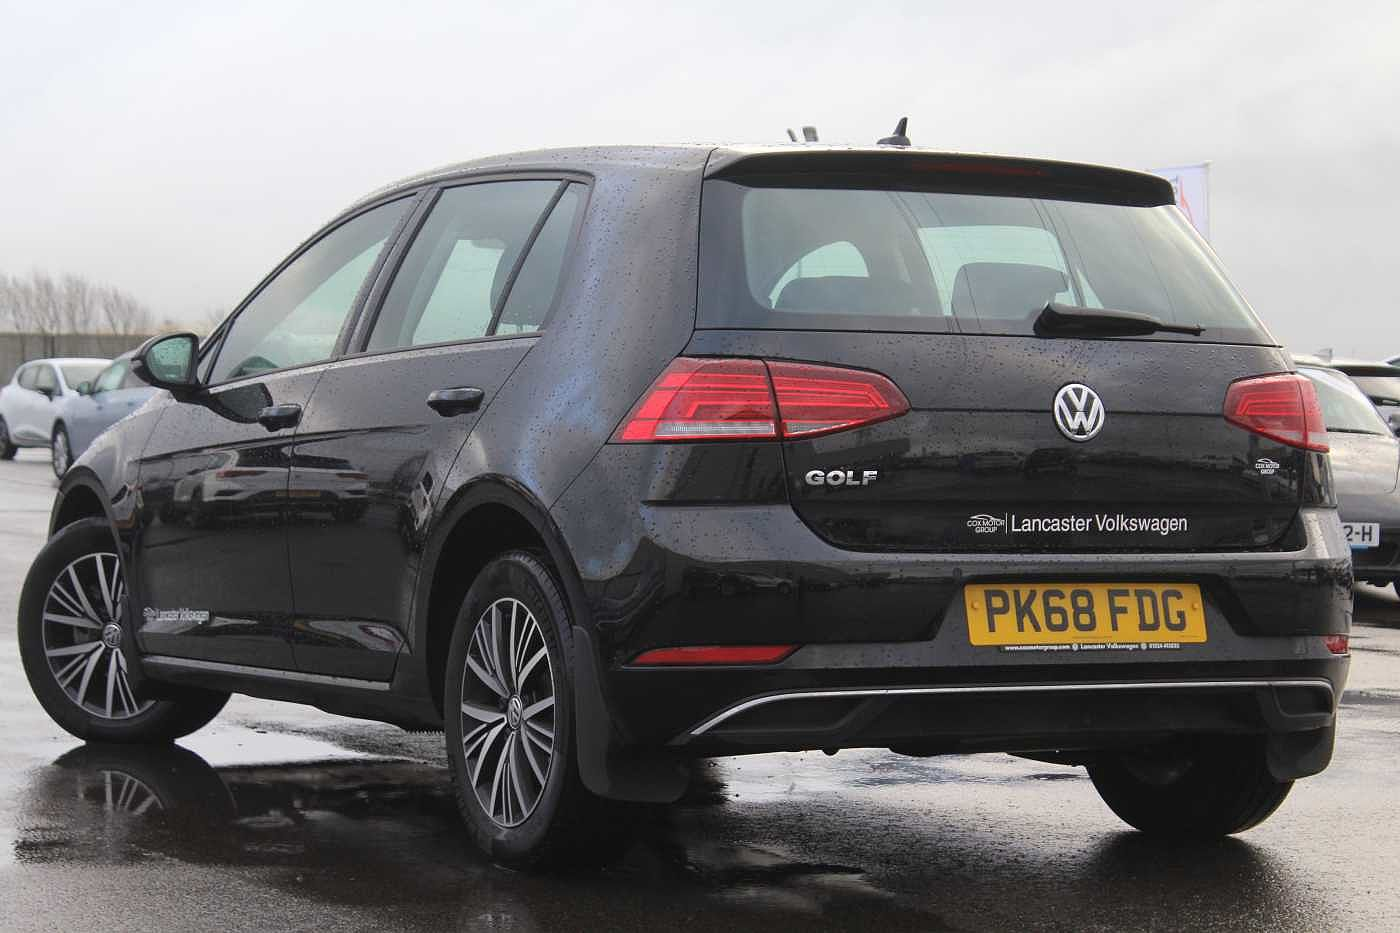 Volkswagen Golf Diesel Hatchback Images